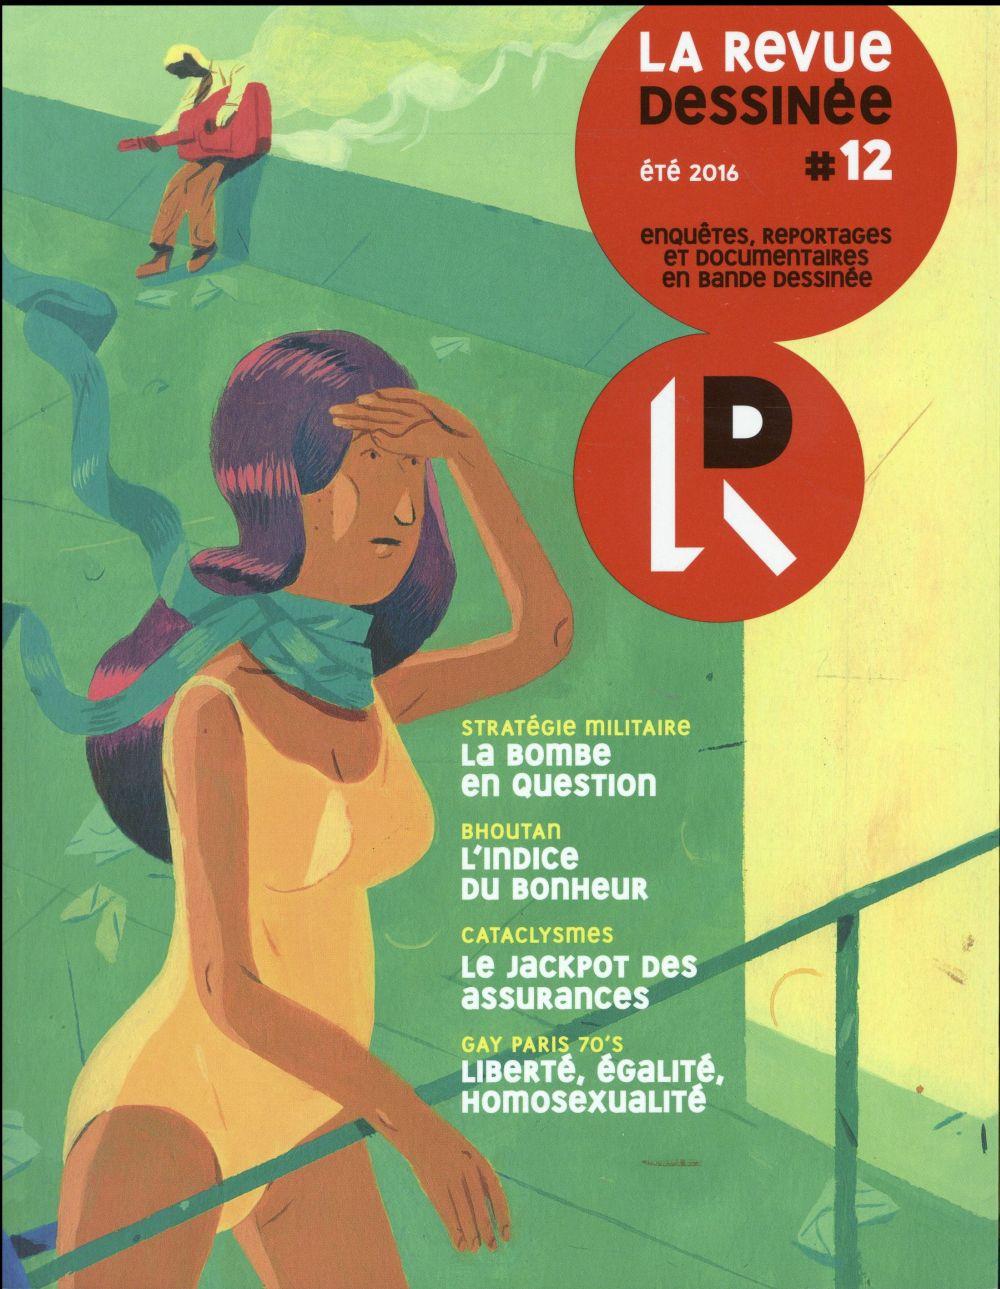 La revue dessinee n.12